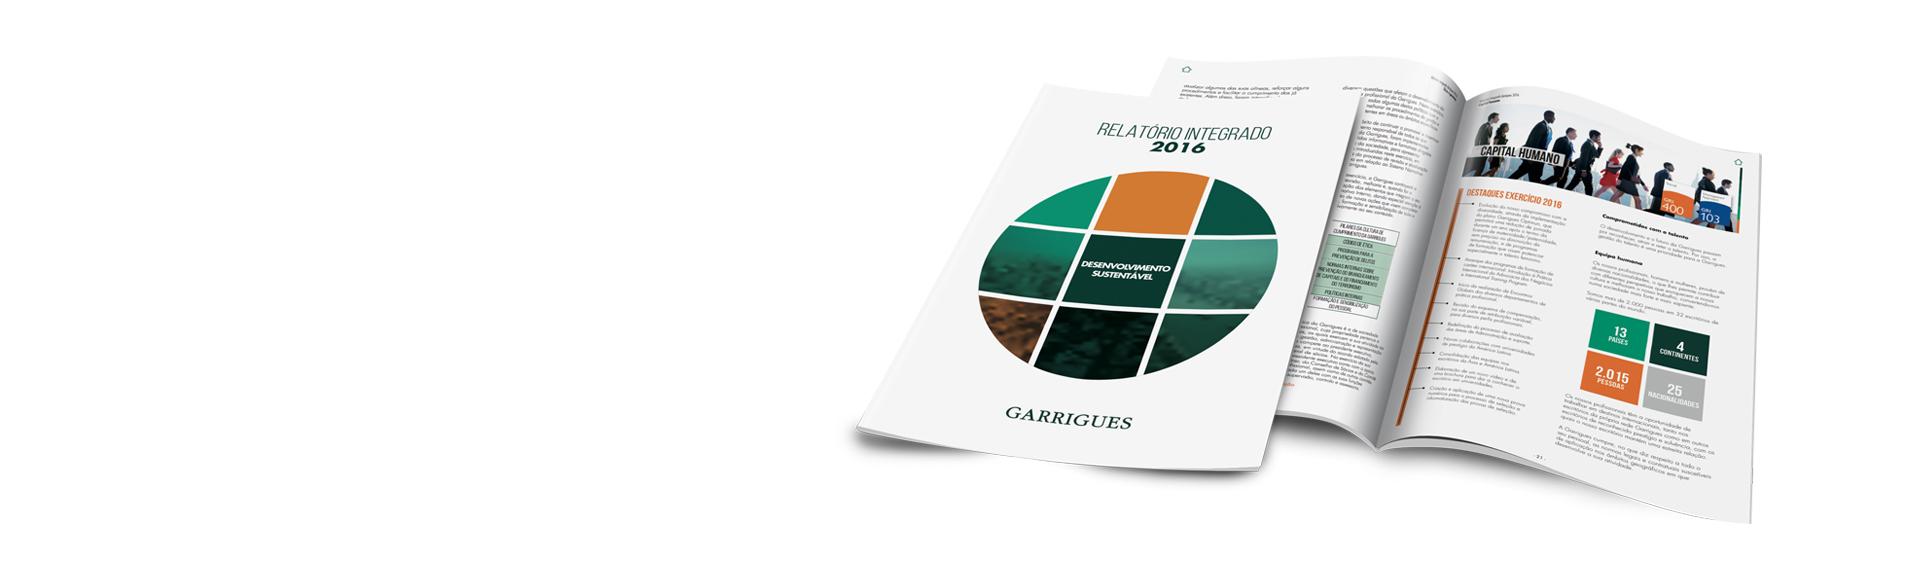 Relatorio Integrado 2016 - Garrigues